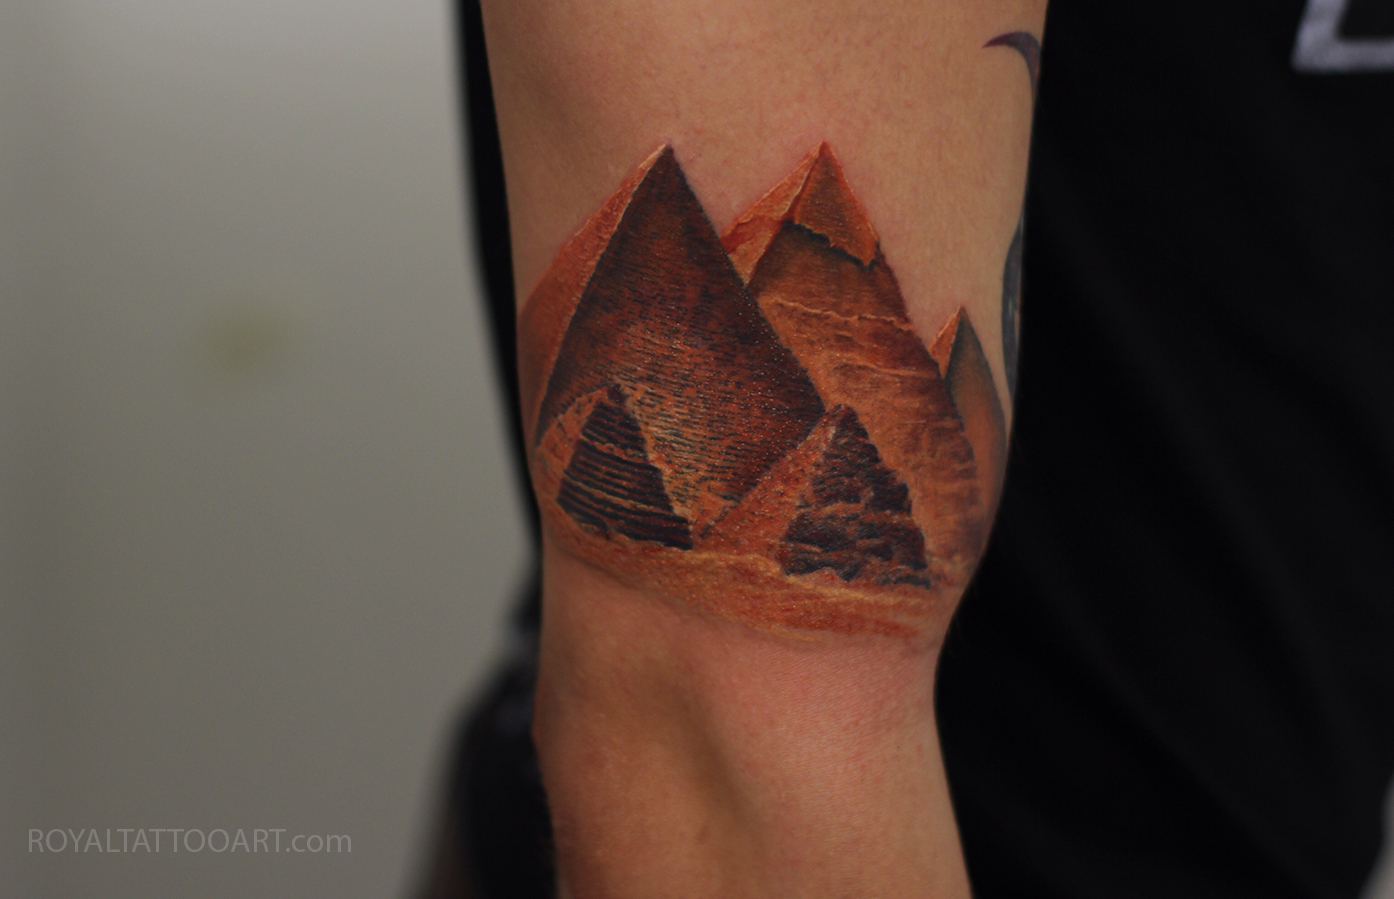 Pramid tattoo realistic color space.jpg